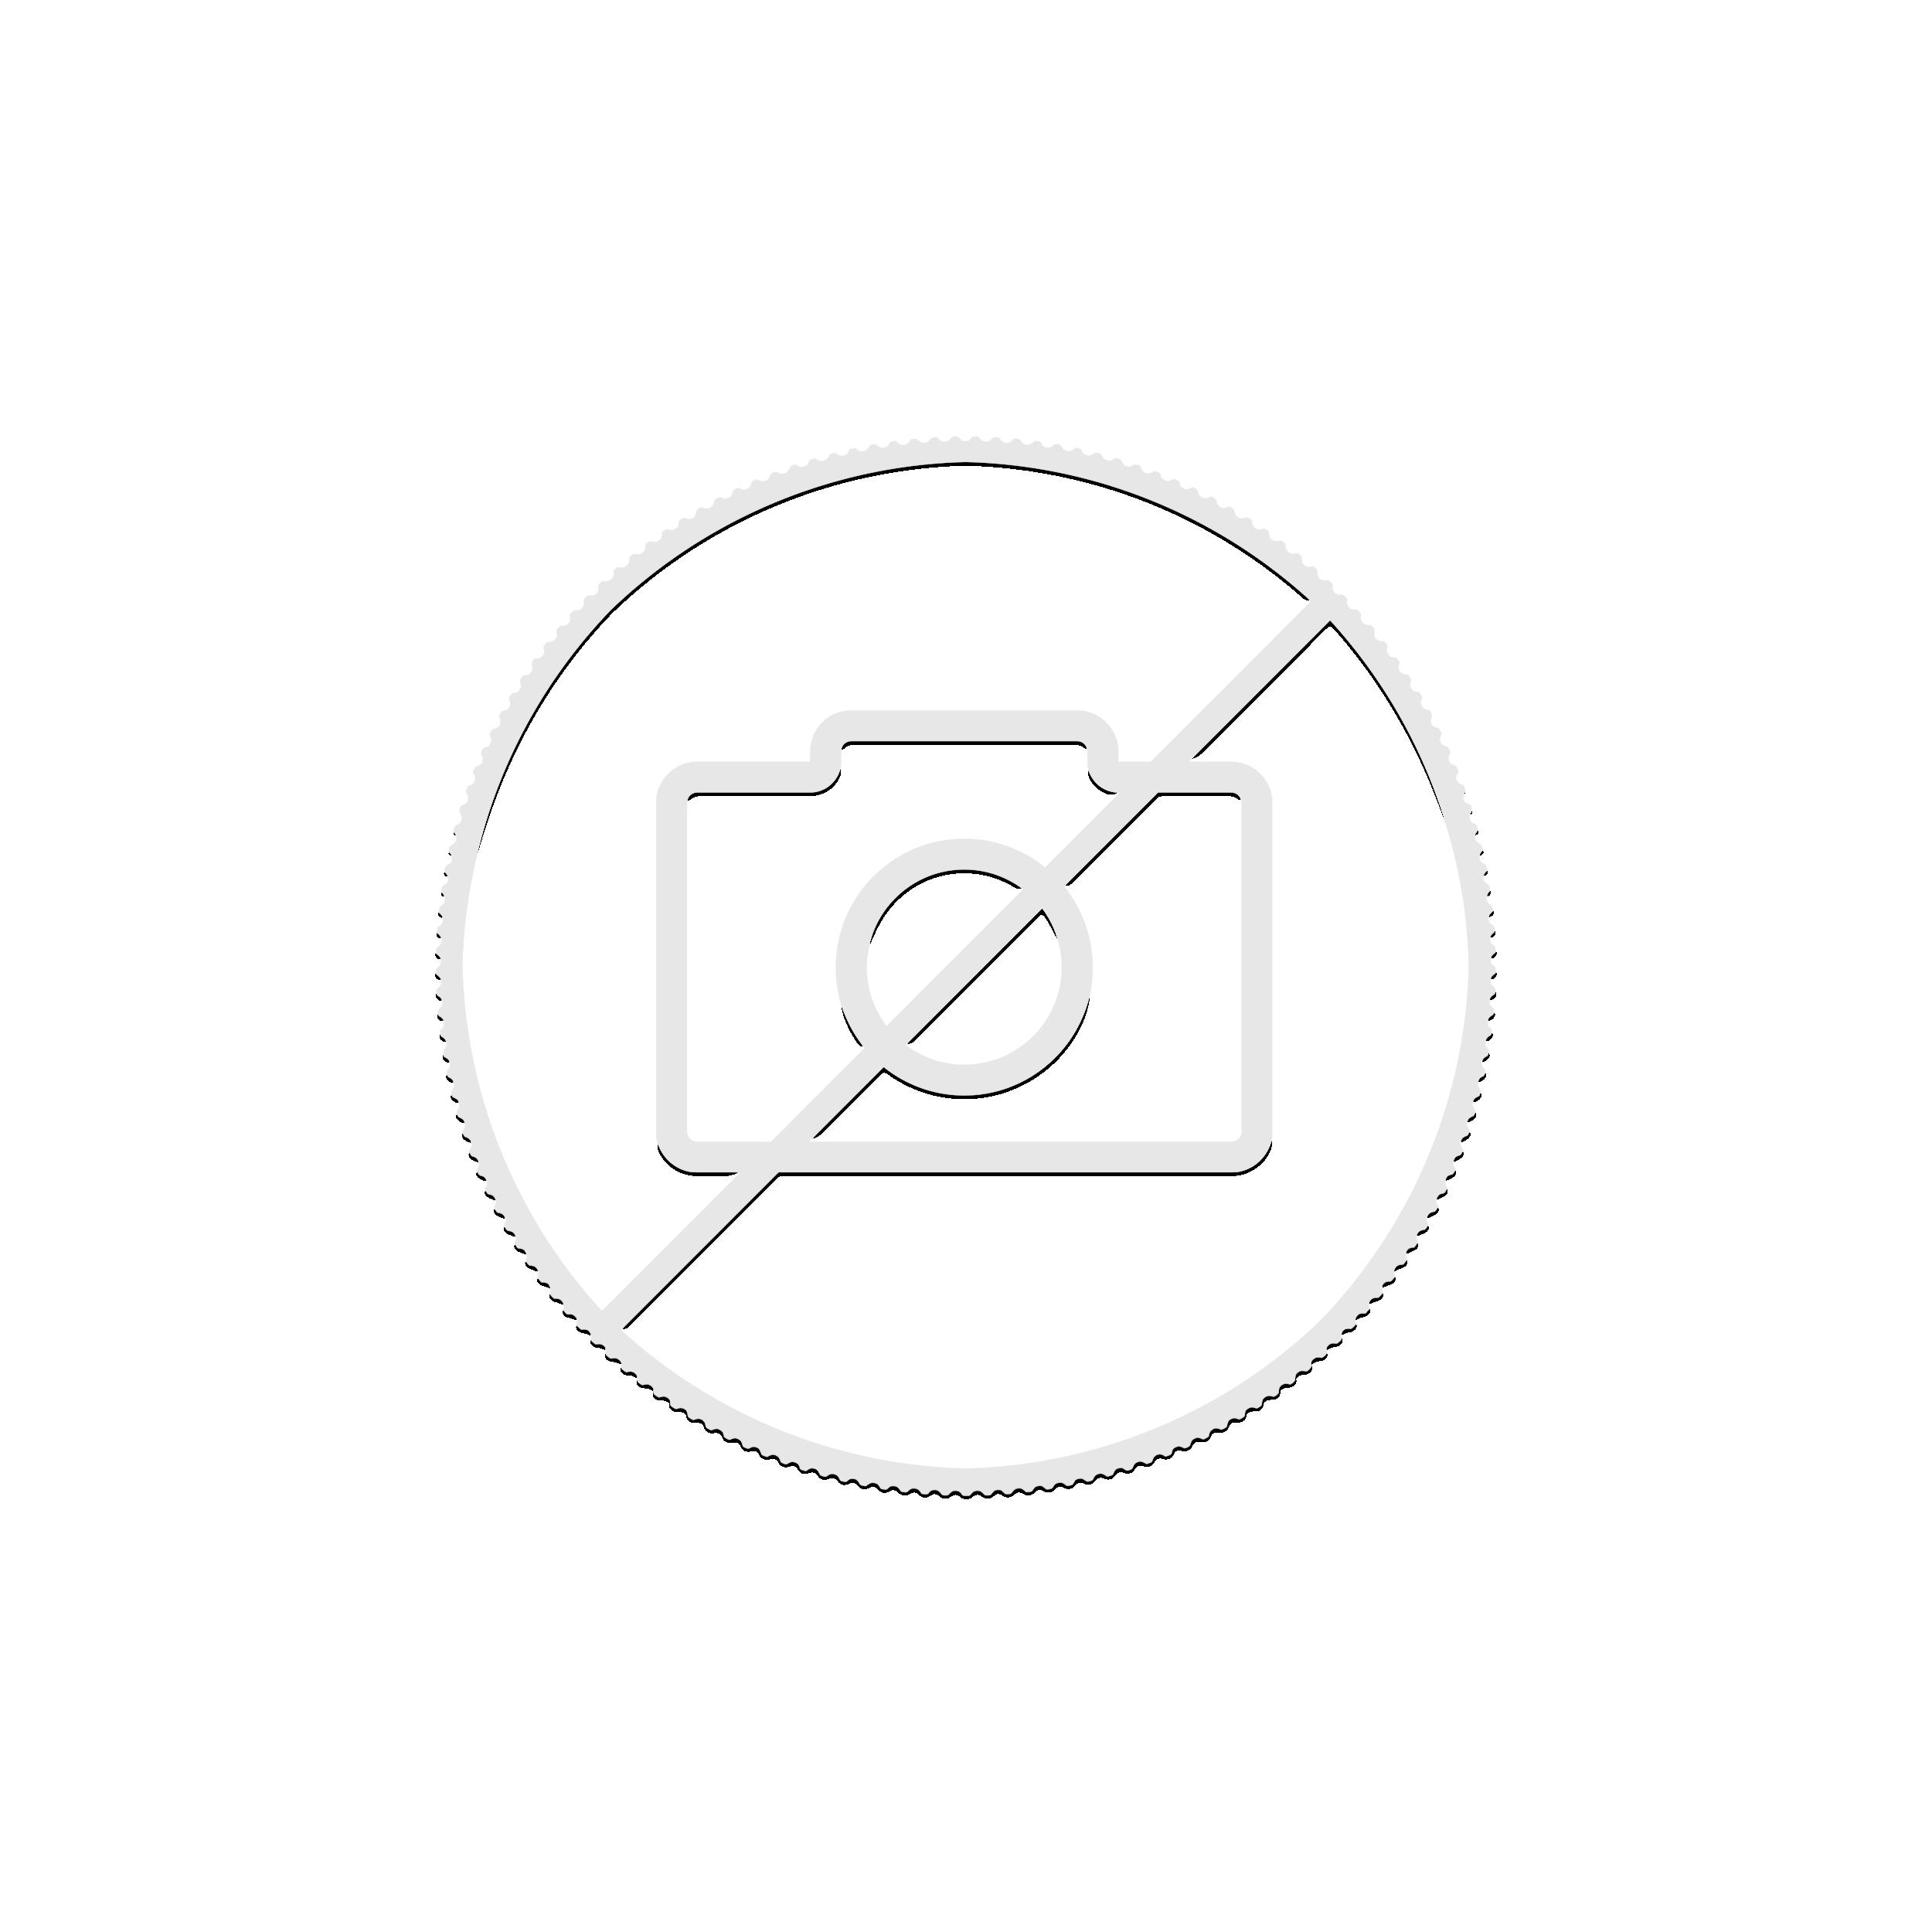 2 troy ounce silver coin Nicolas Flamel - Philosophers Stone 2021